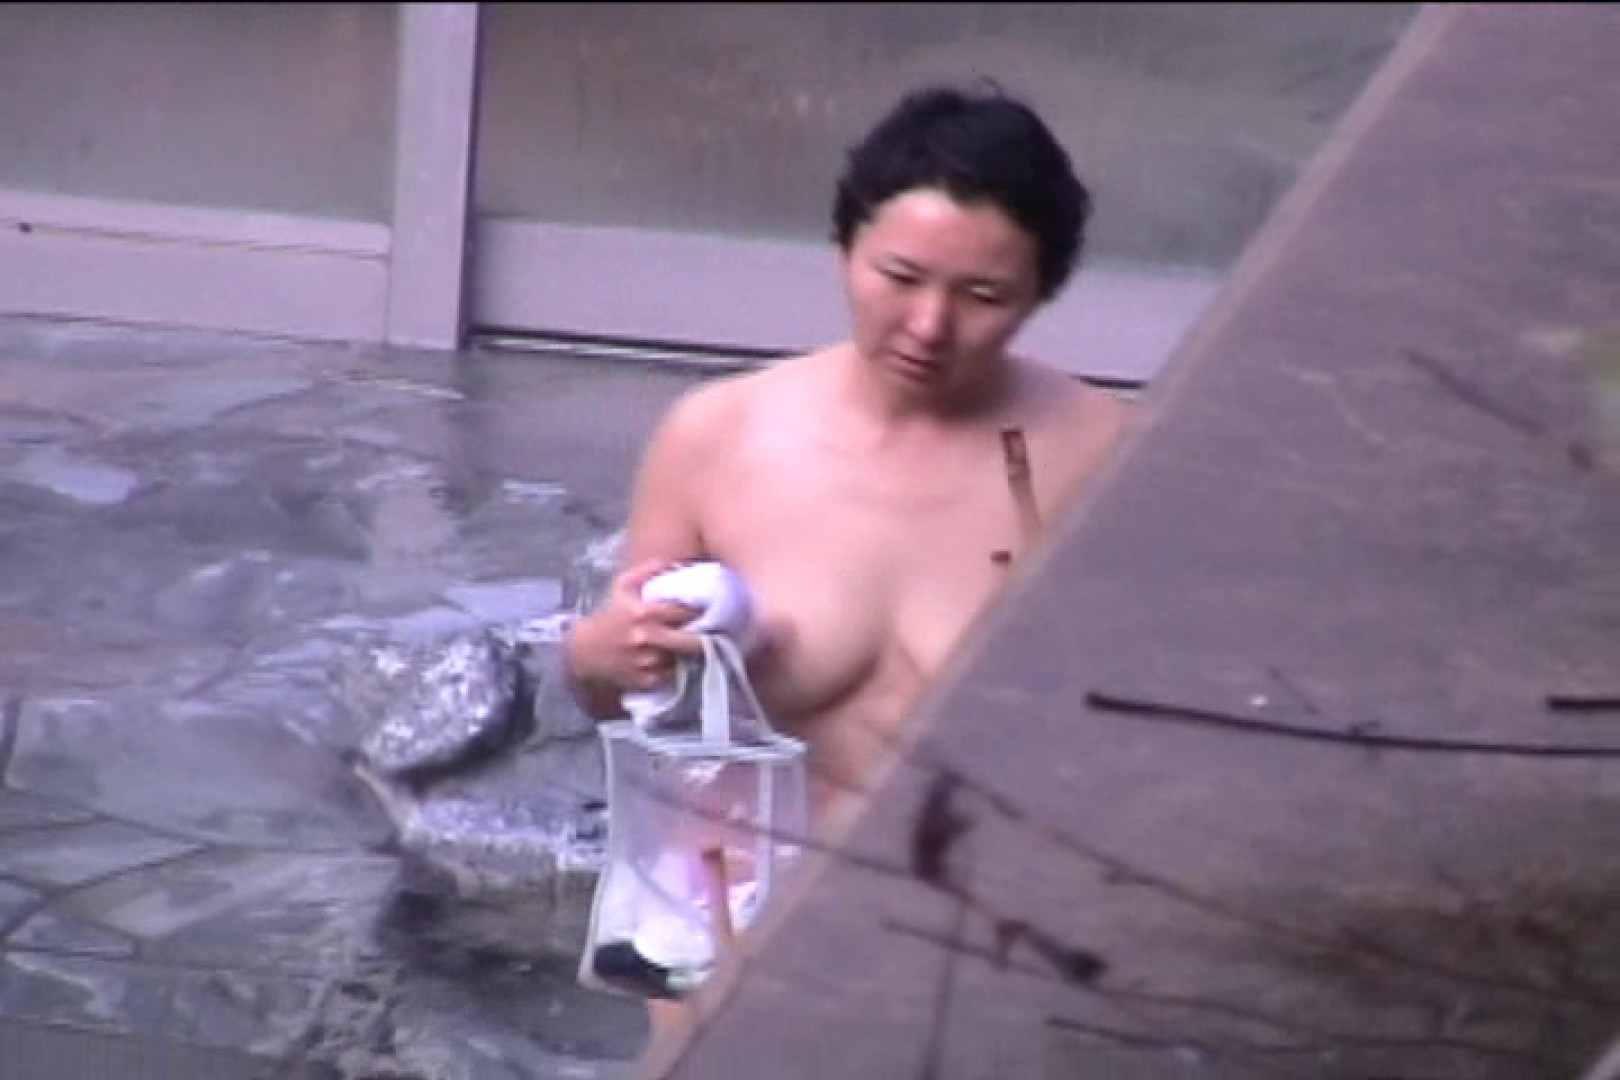 Aquaな露天風呂Vol.451 OLセックス | 盗撮  66画像 25